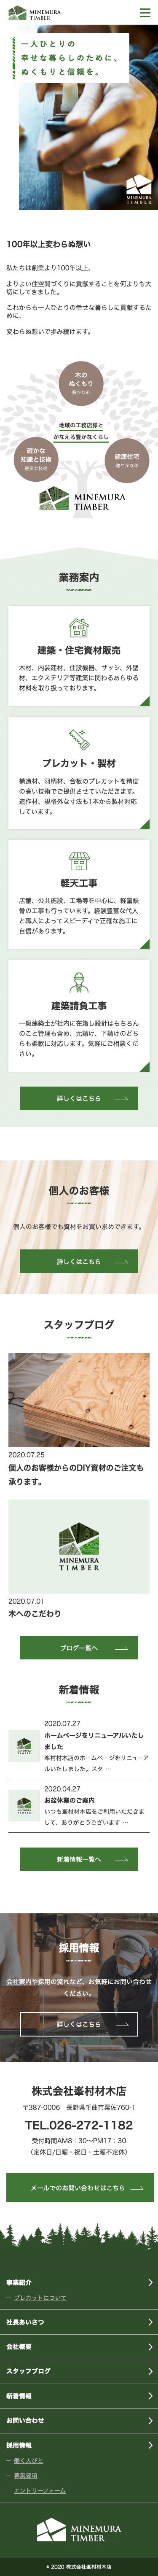 株式会社峯村材木店spイメージ